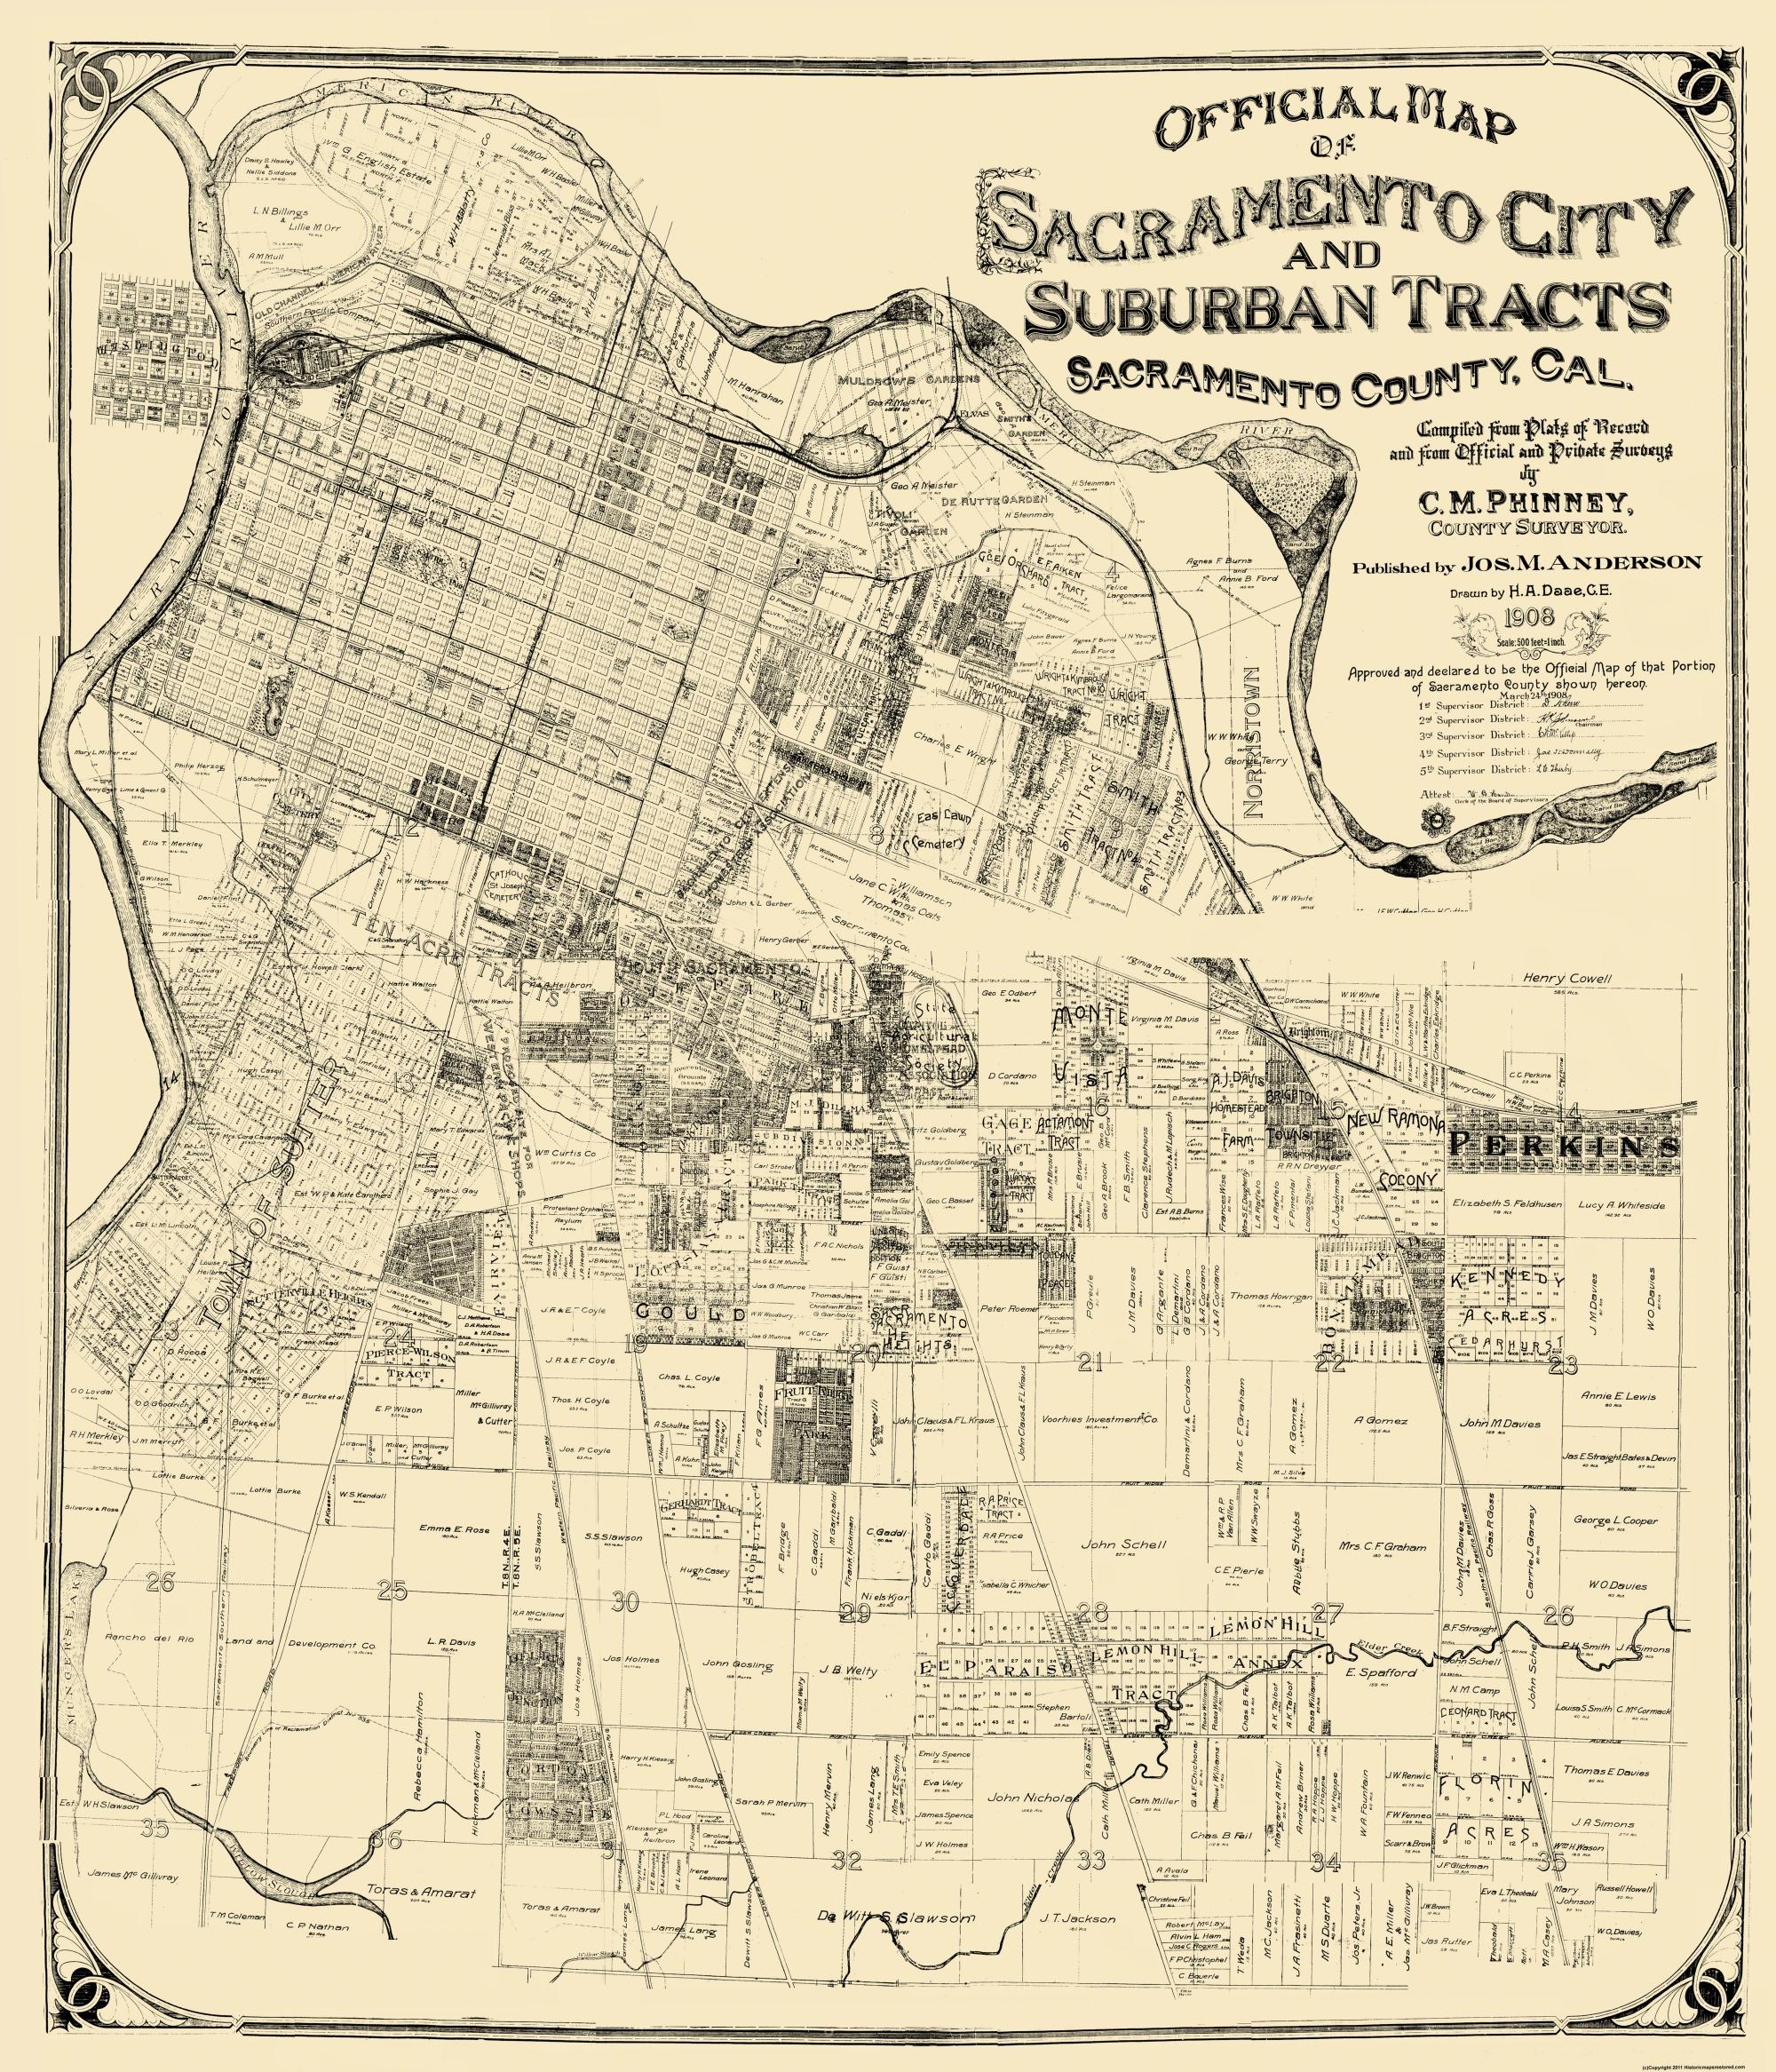 Old City Map Sacramento California Landowner 1908 - Us Map 1908